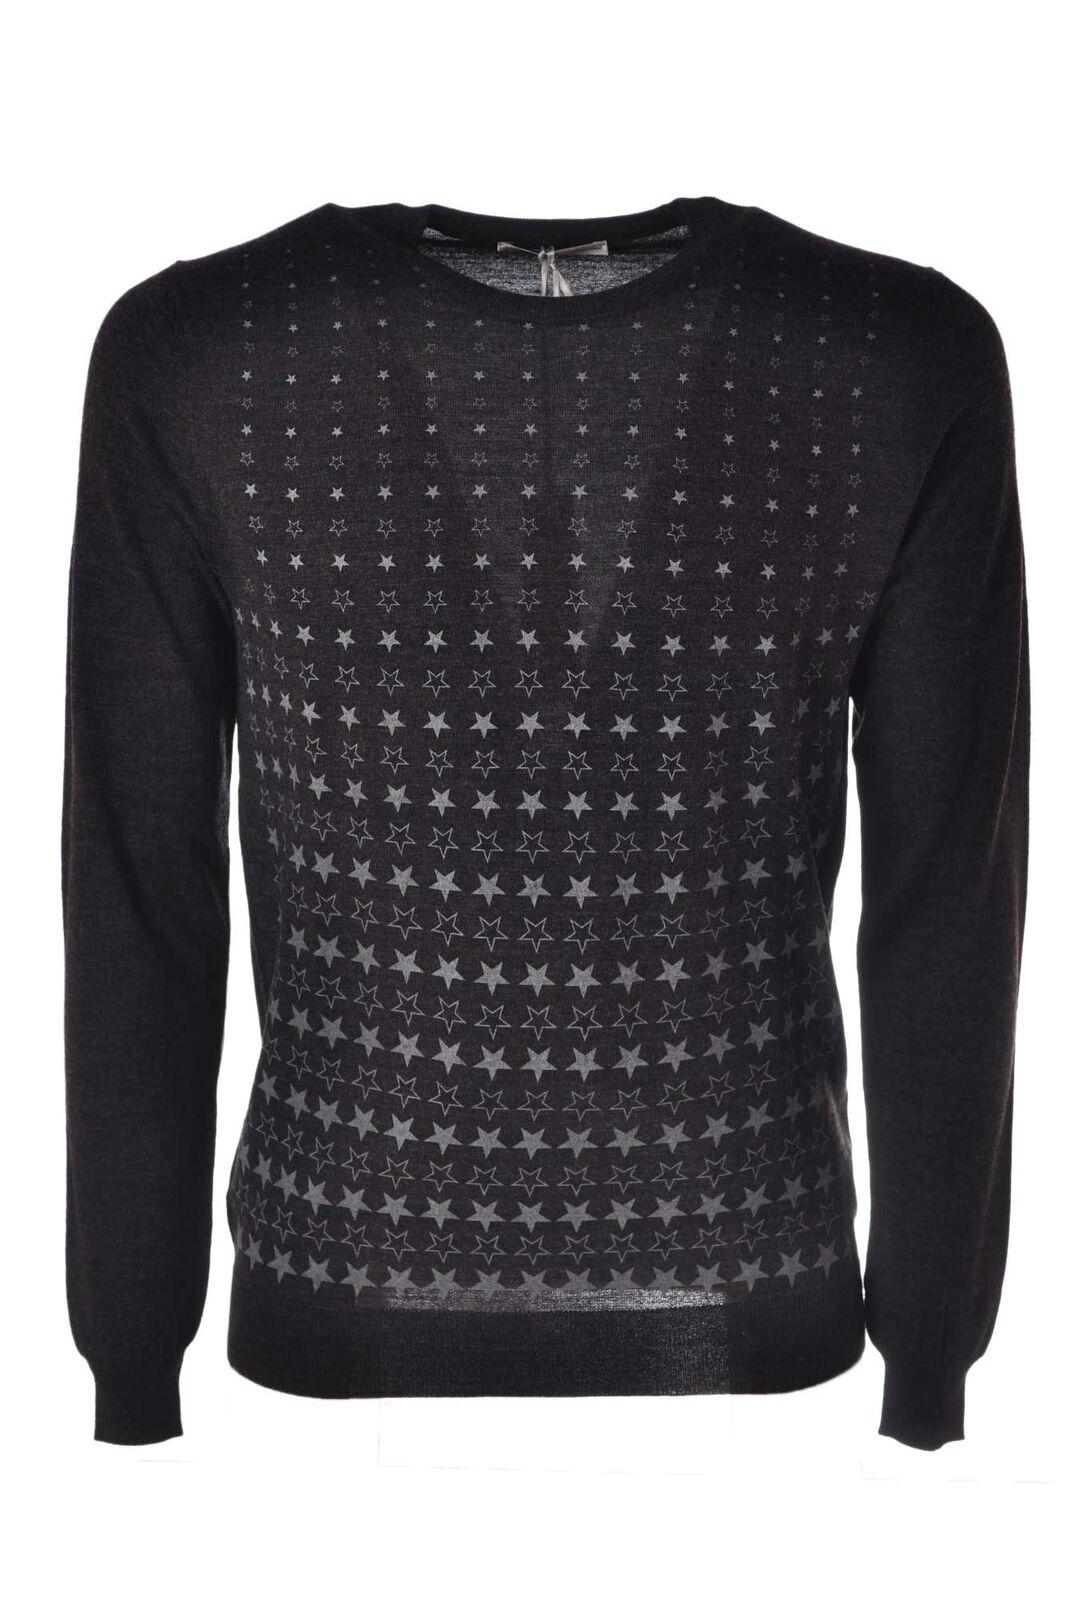 Daniele Alessandrini  -  Sweaters - Male - Grau - 4384525A183934